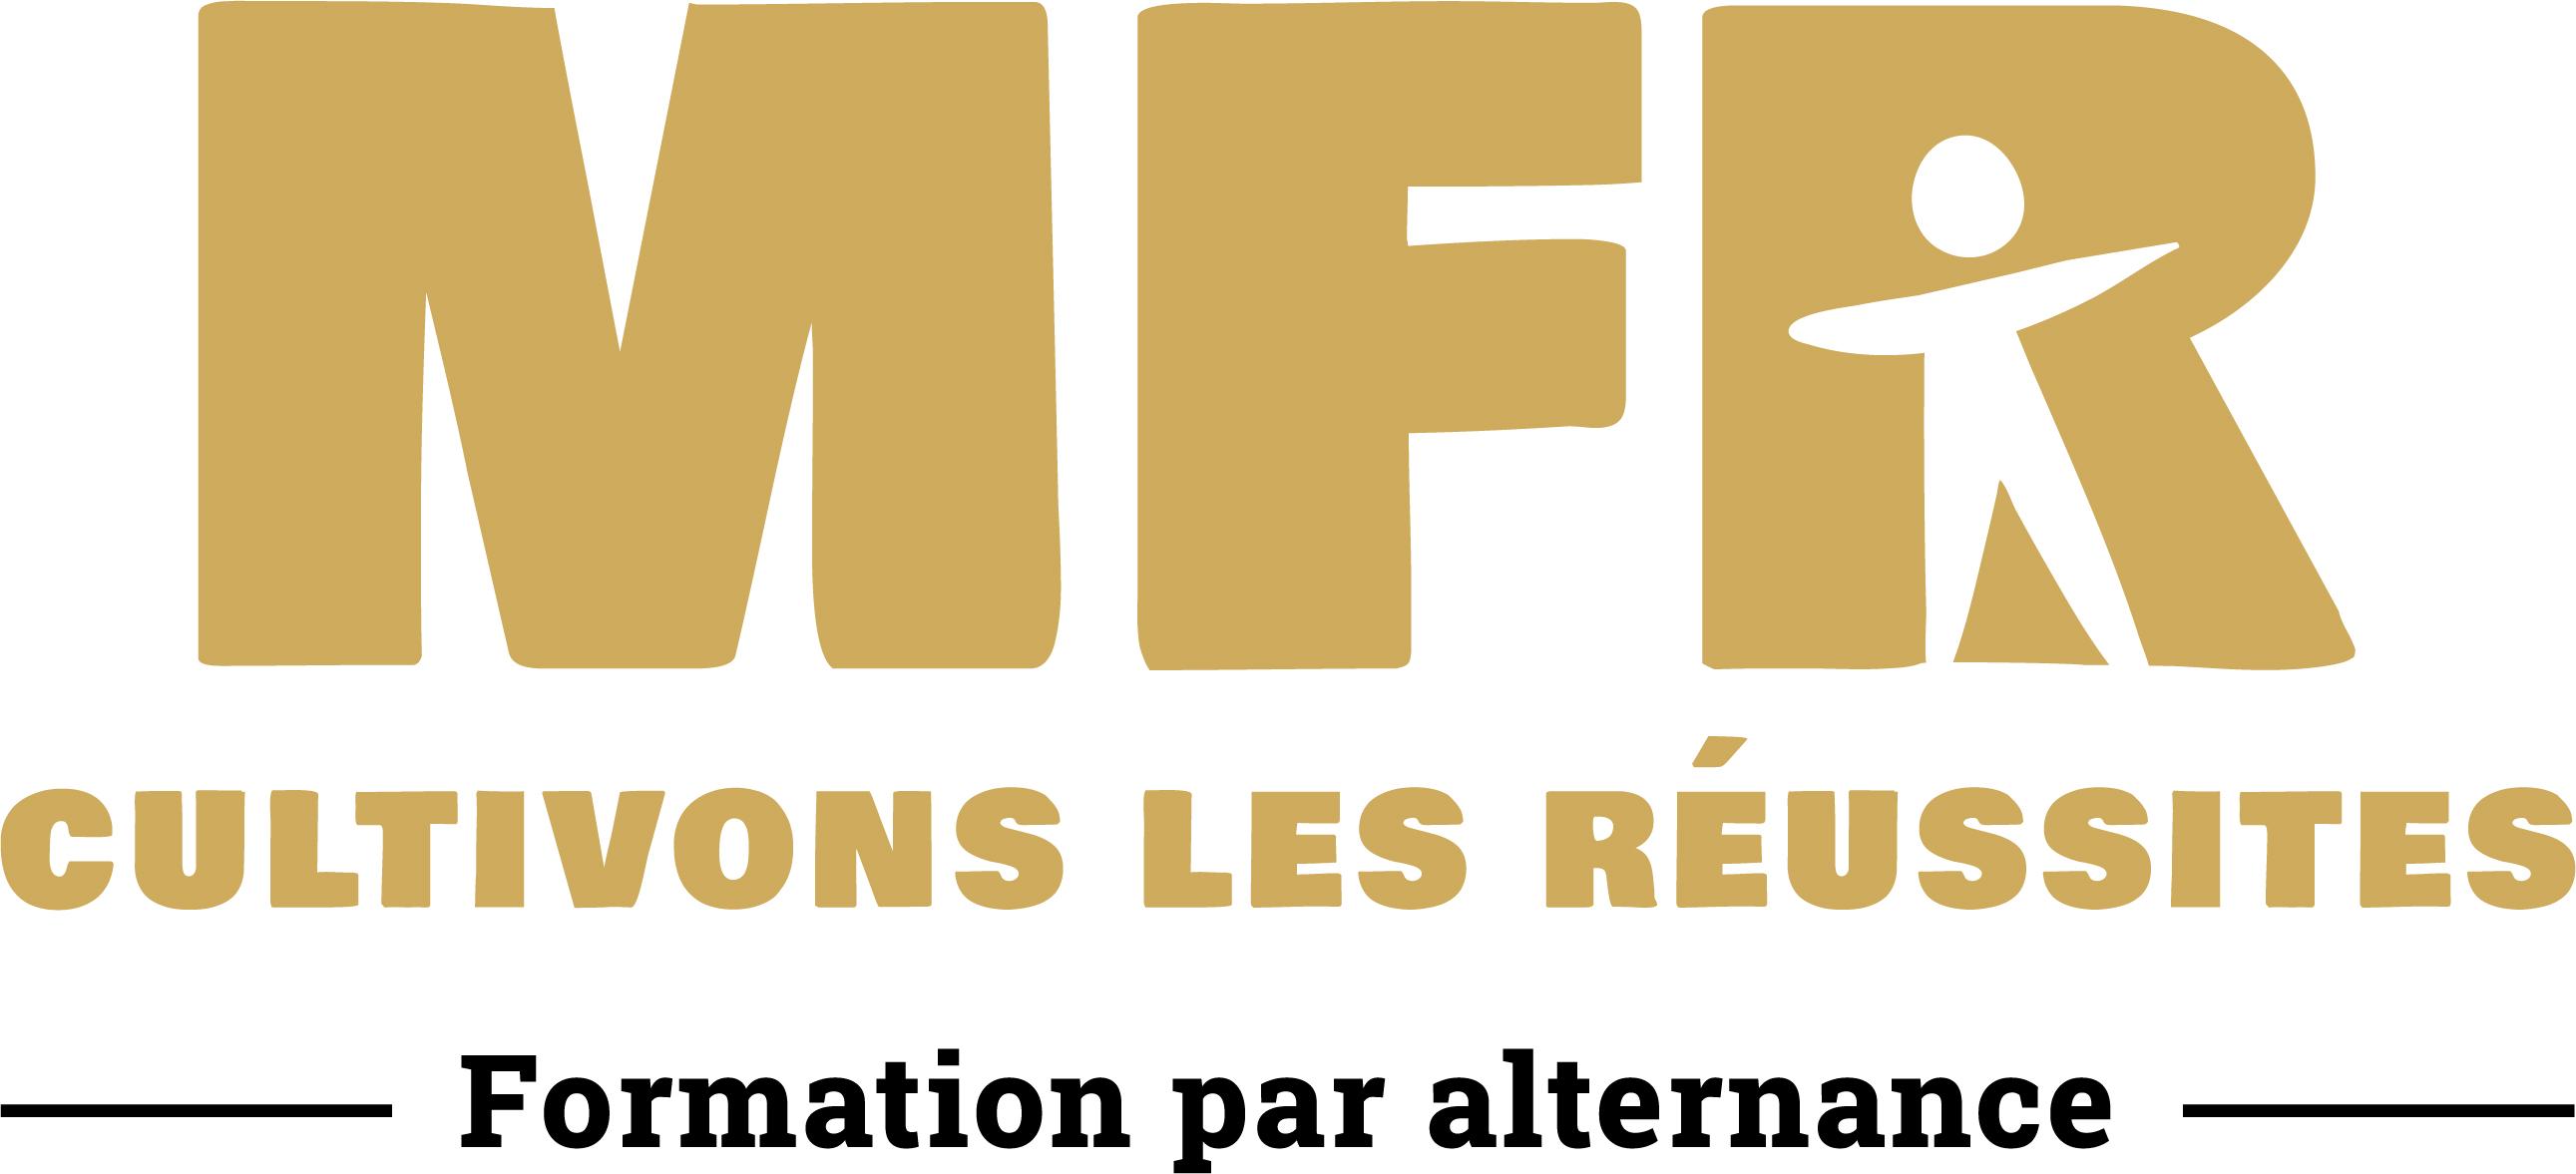 Logo Fédération des MFR Finistère